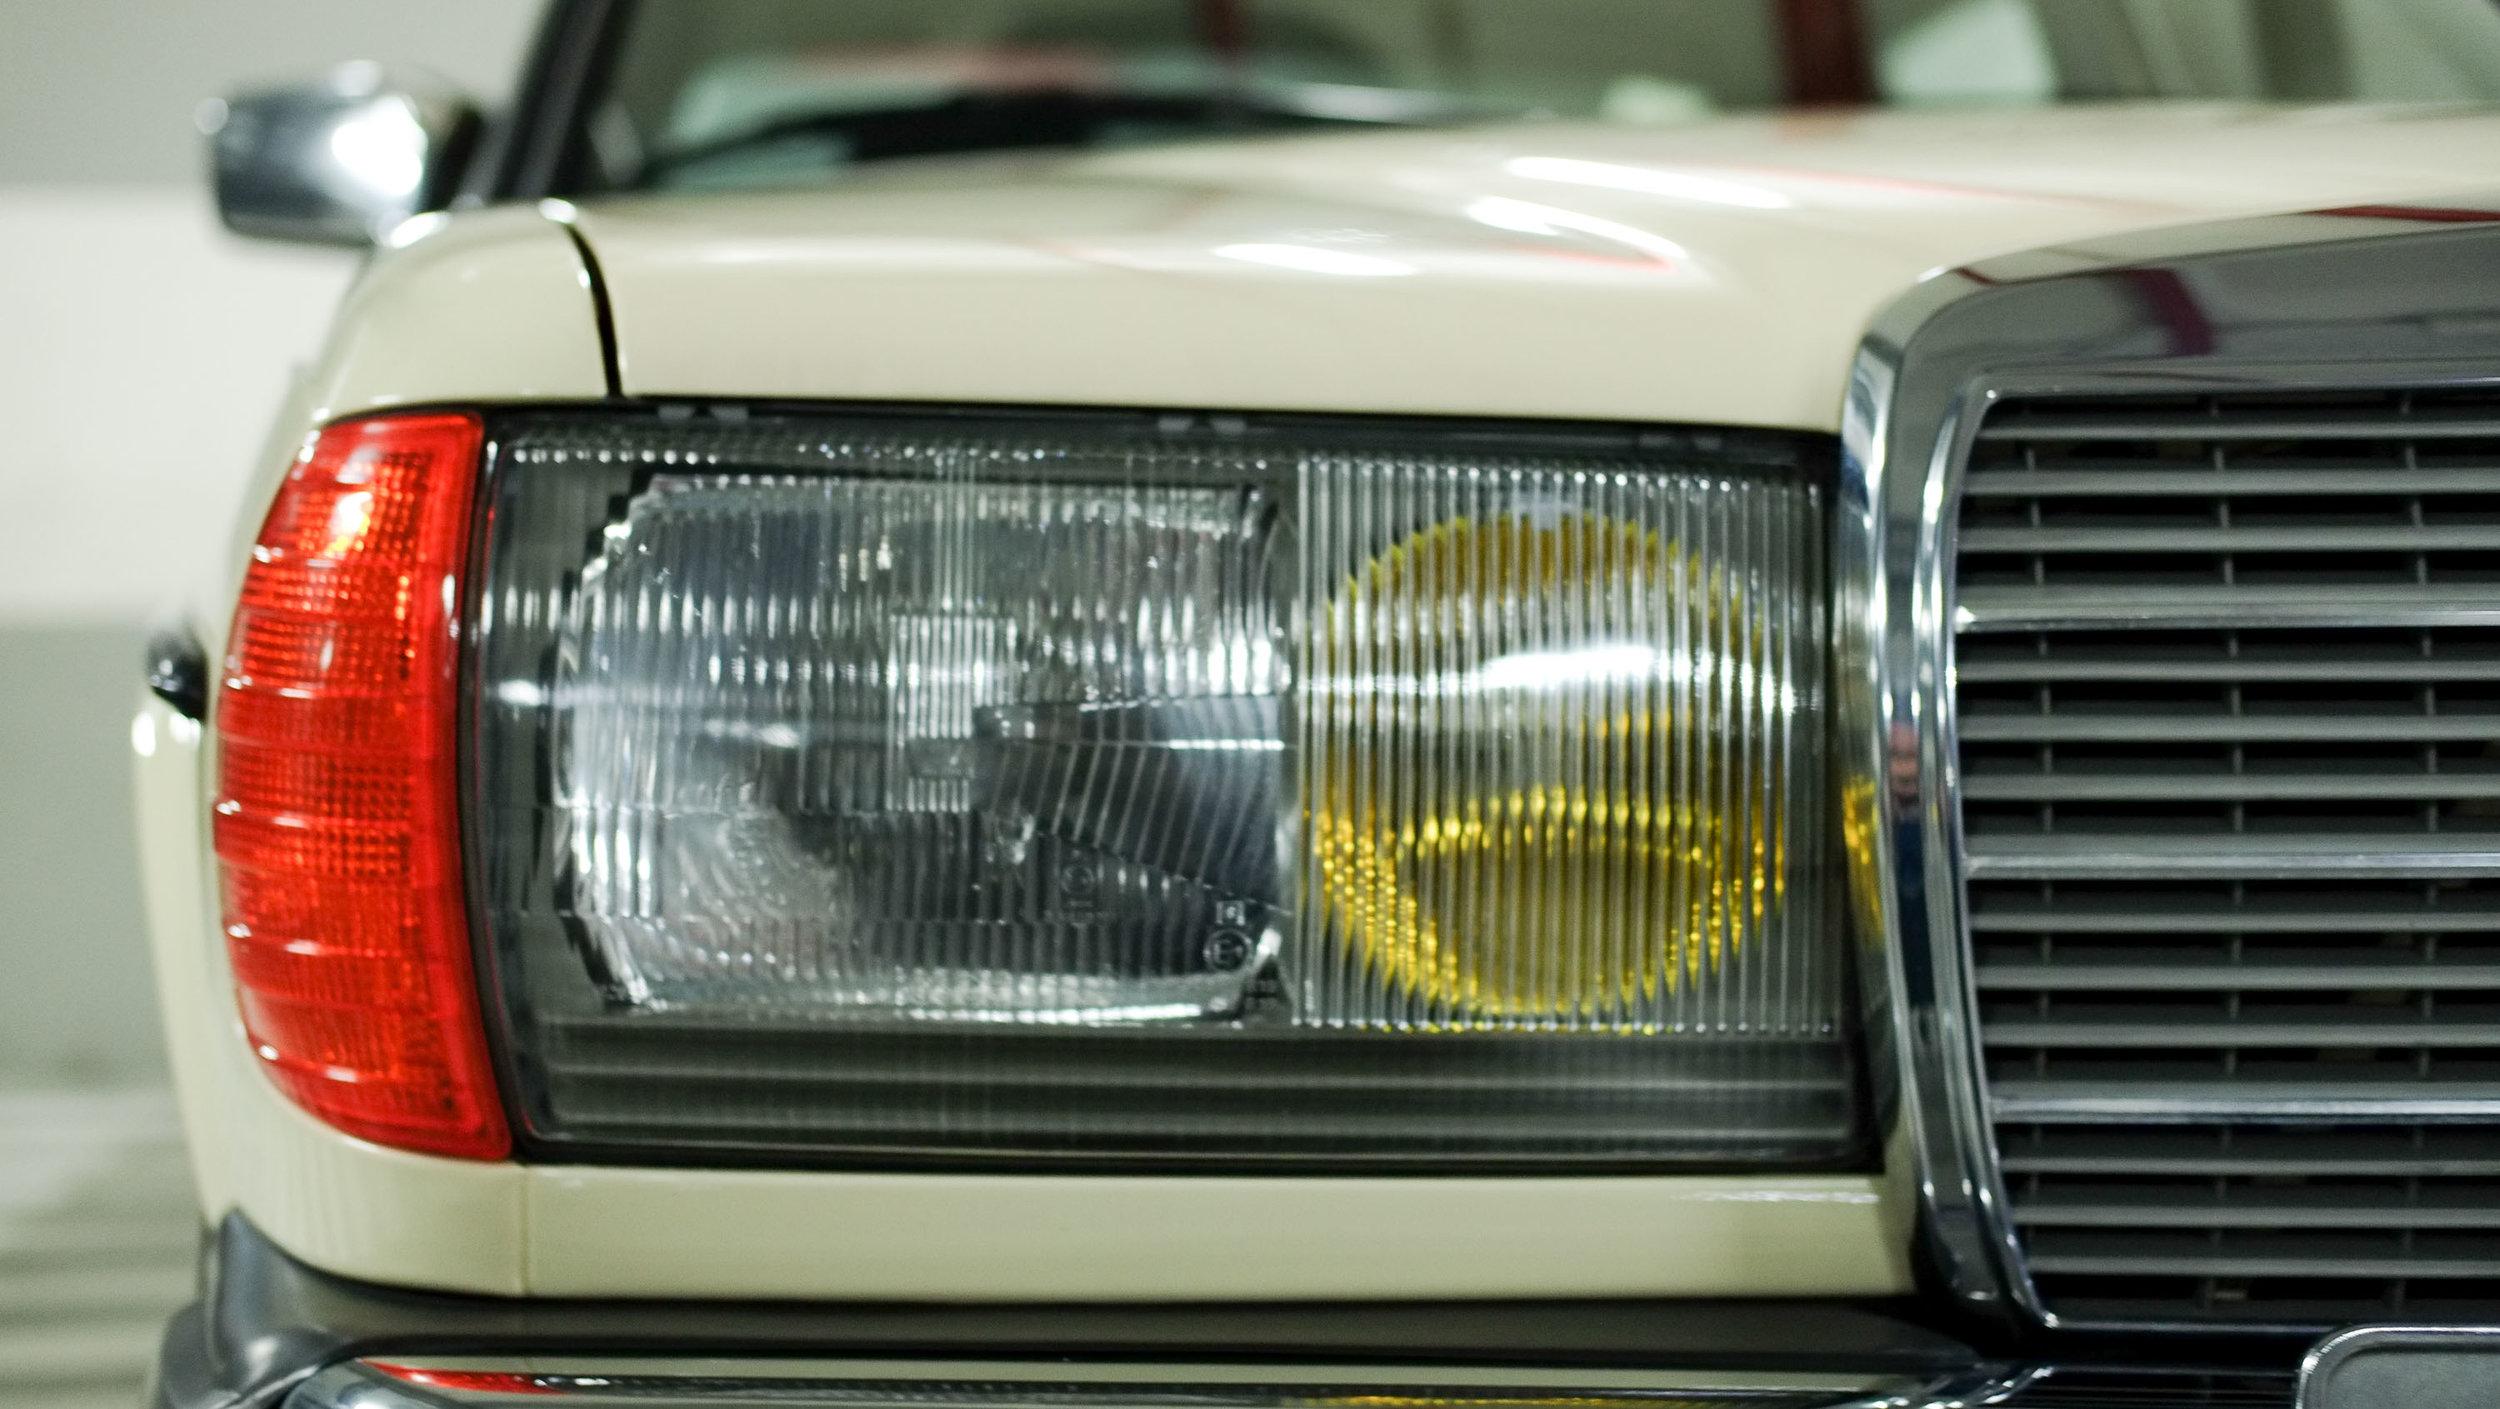 coolnvintage Mercedes-Benz W123 300D (27 of 59).jpg